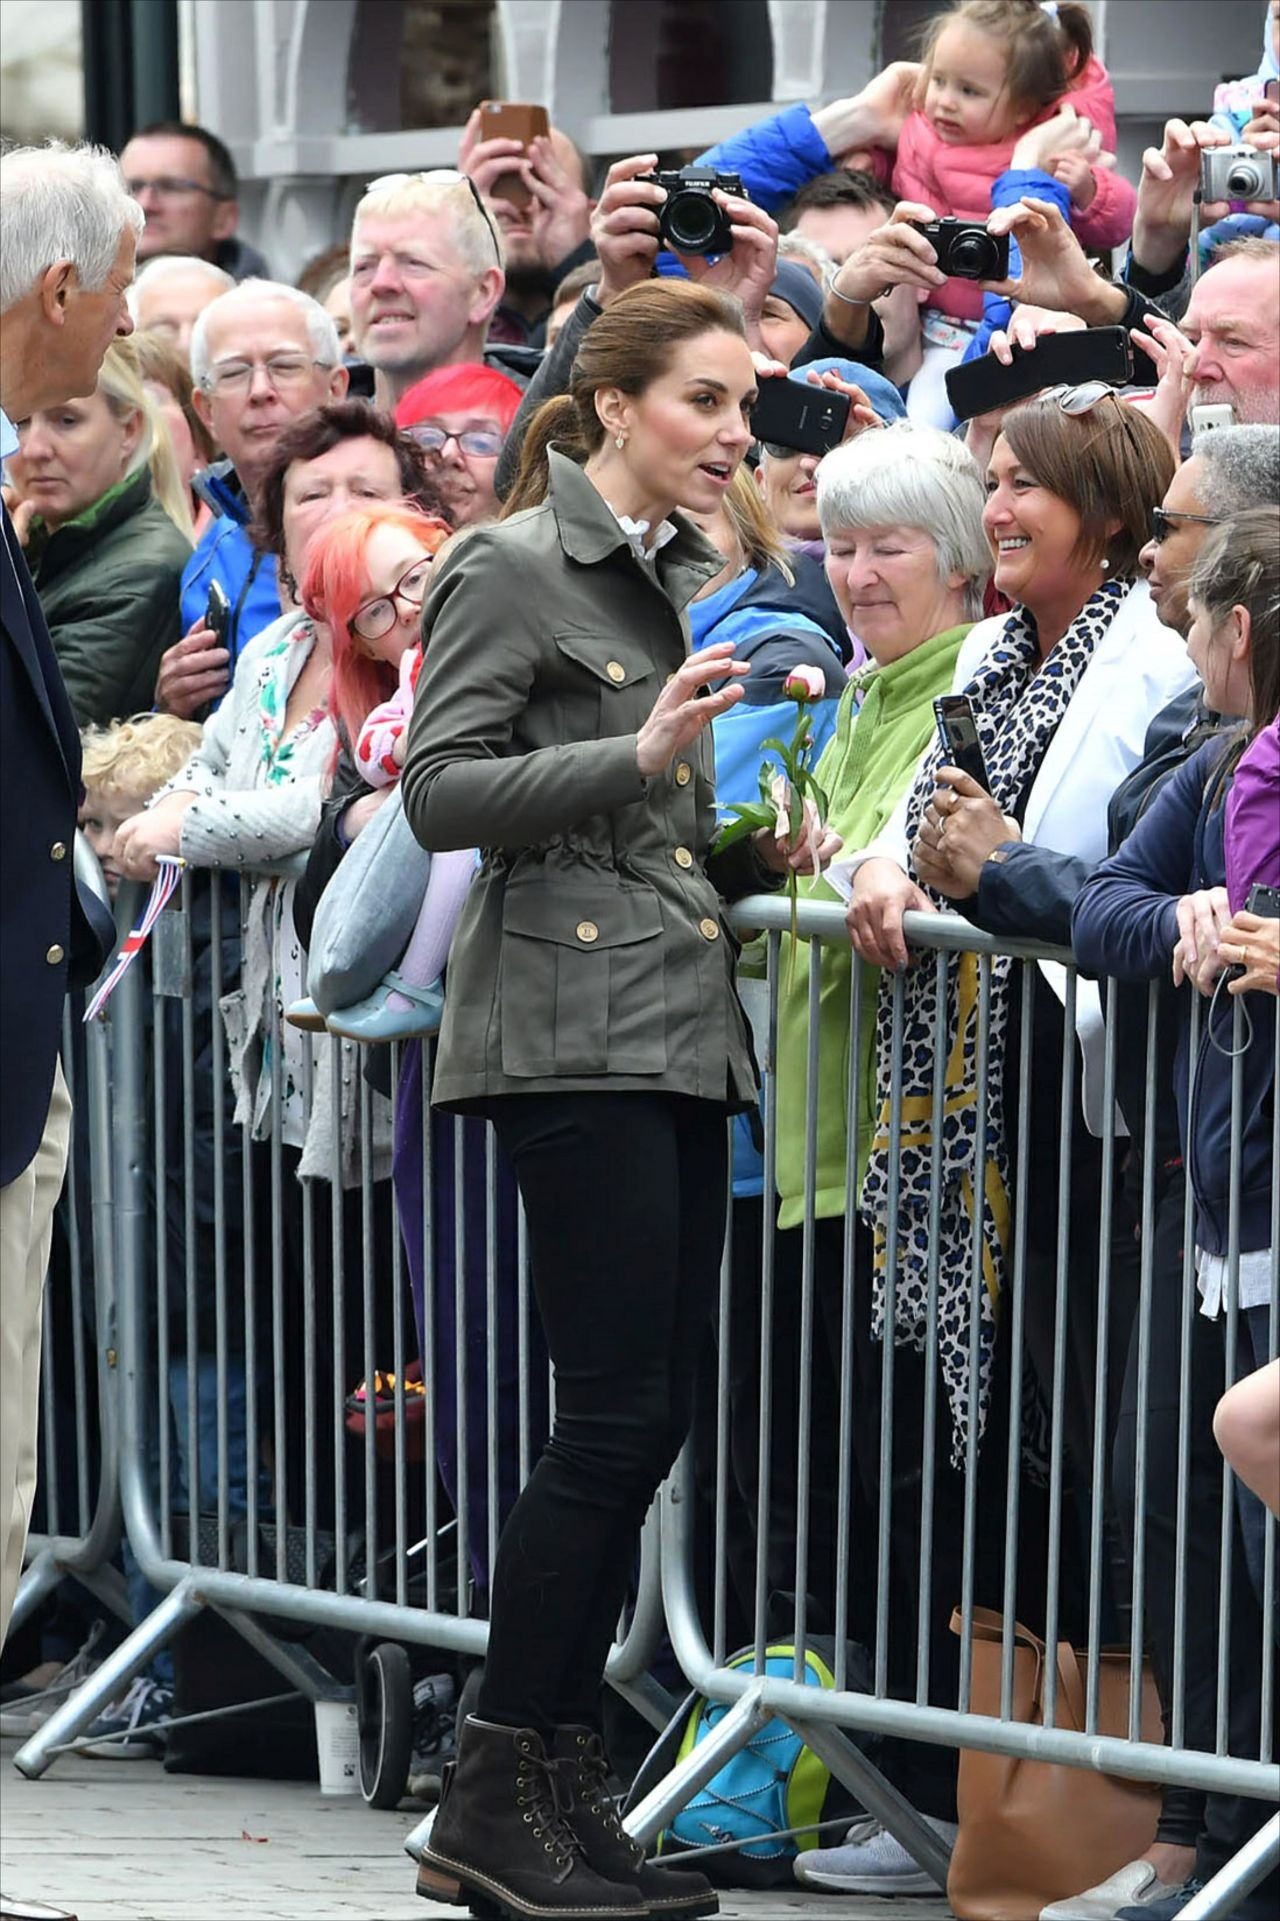 Kate Middleton Keswick Market Place At Cumbria In